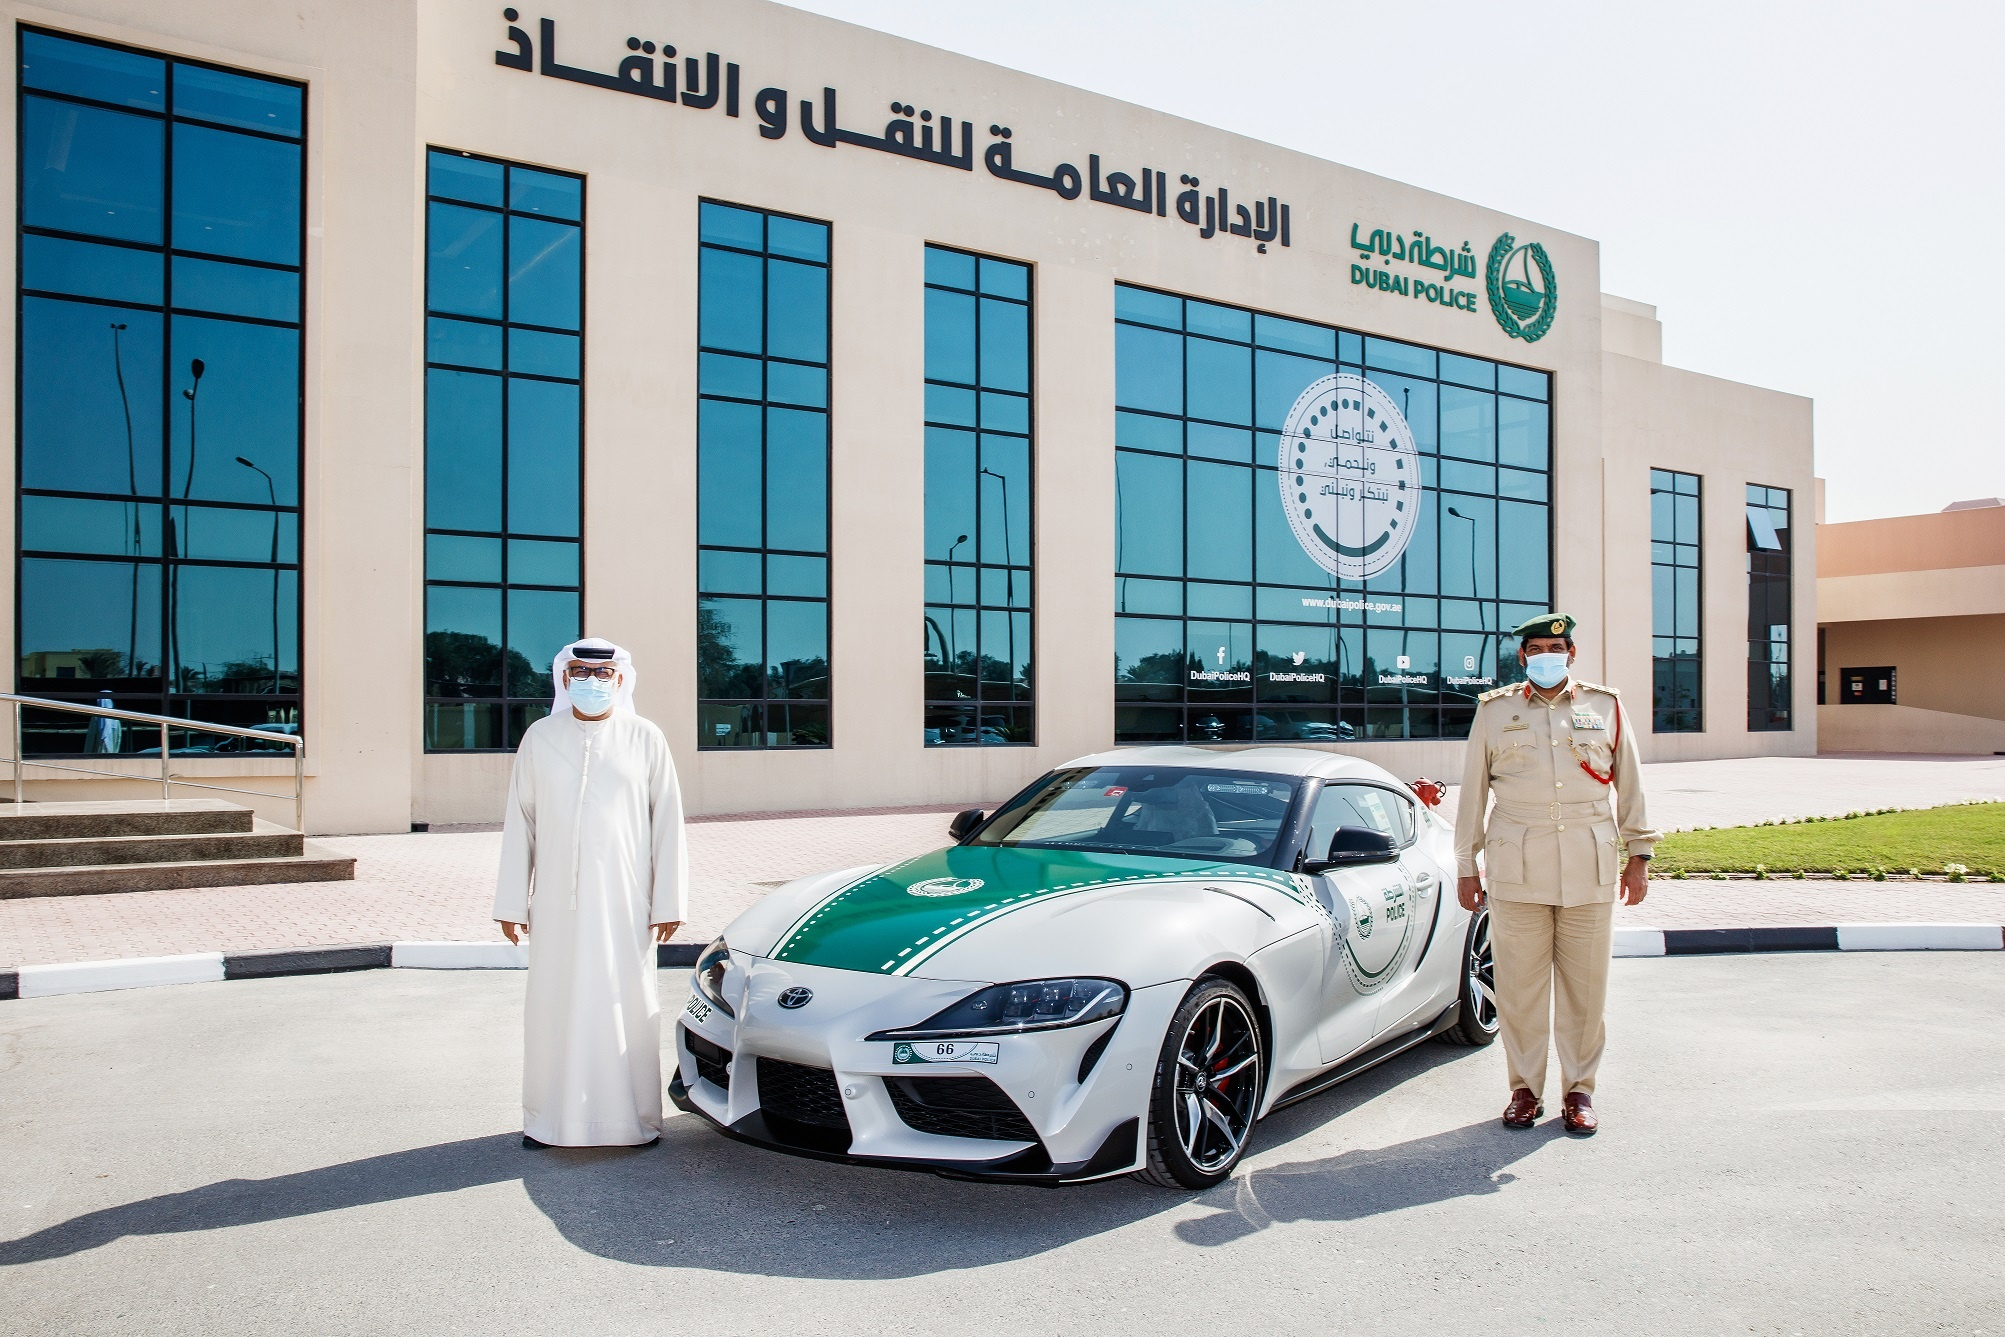 Dubai Police Bolsters Toyota Fleet with Addition of Legendary all-new 2021 Toyota GR Supra